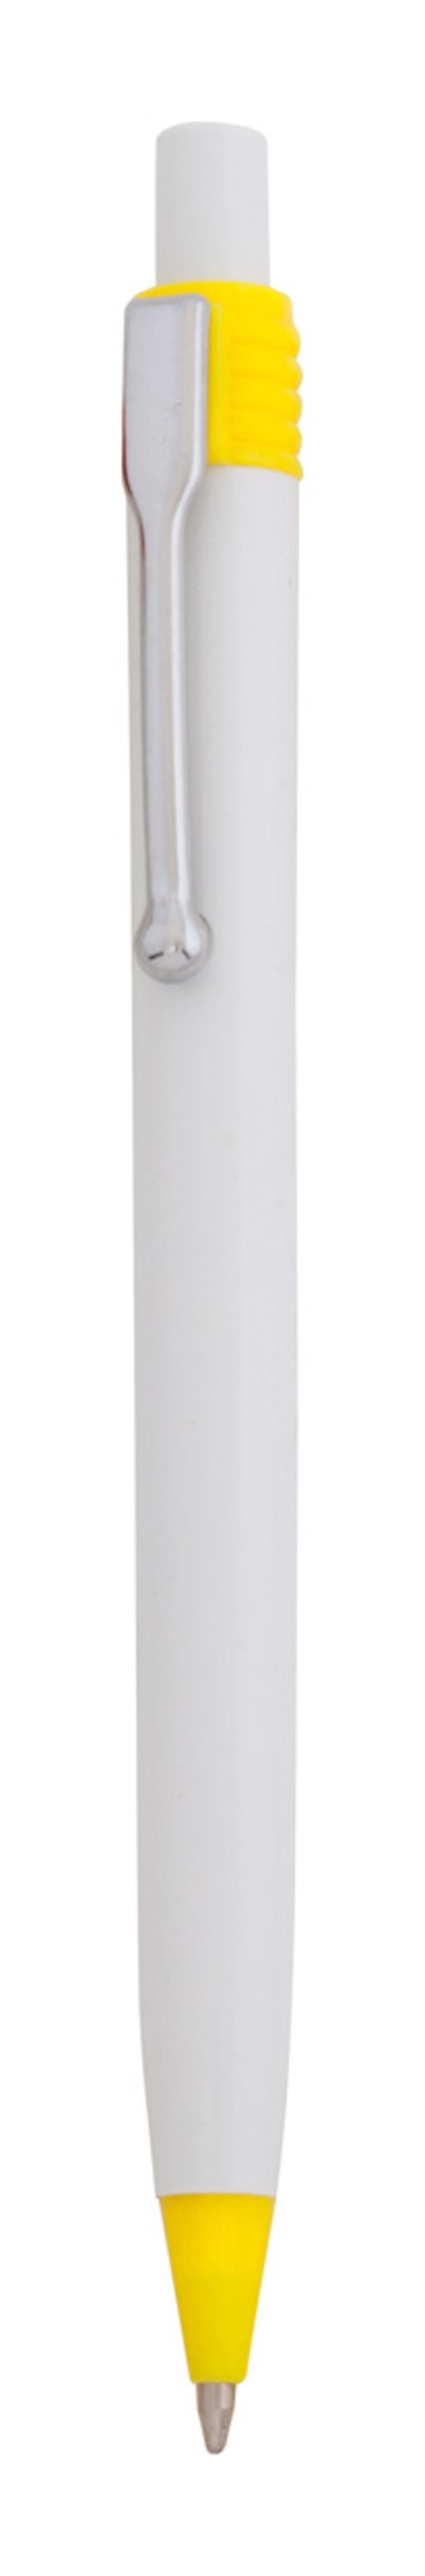 Hytal ballpoint pen